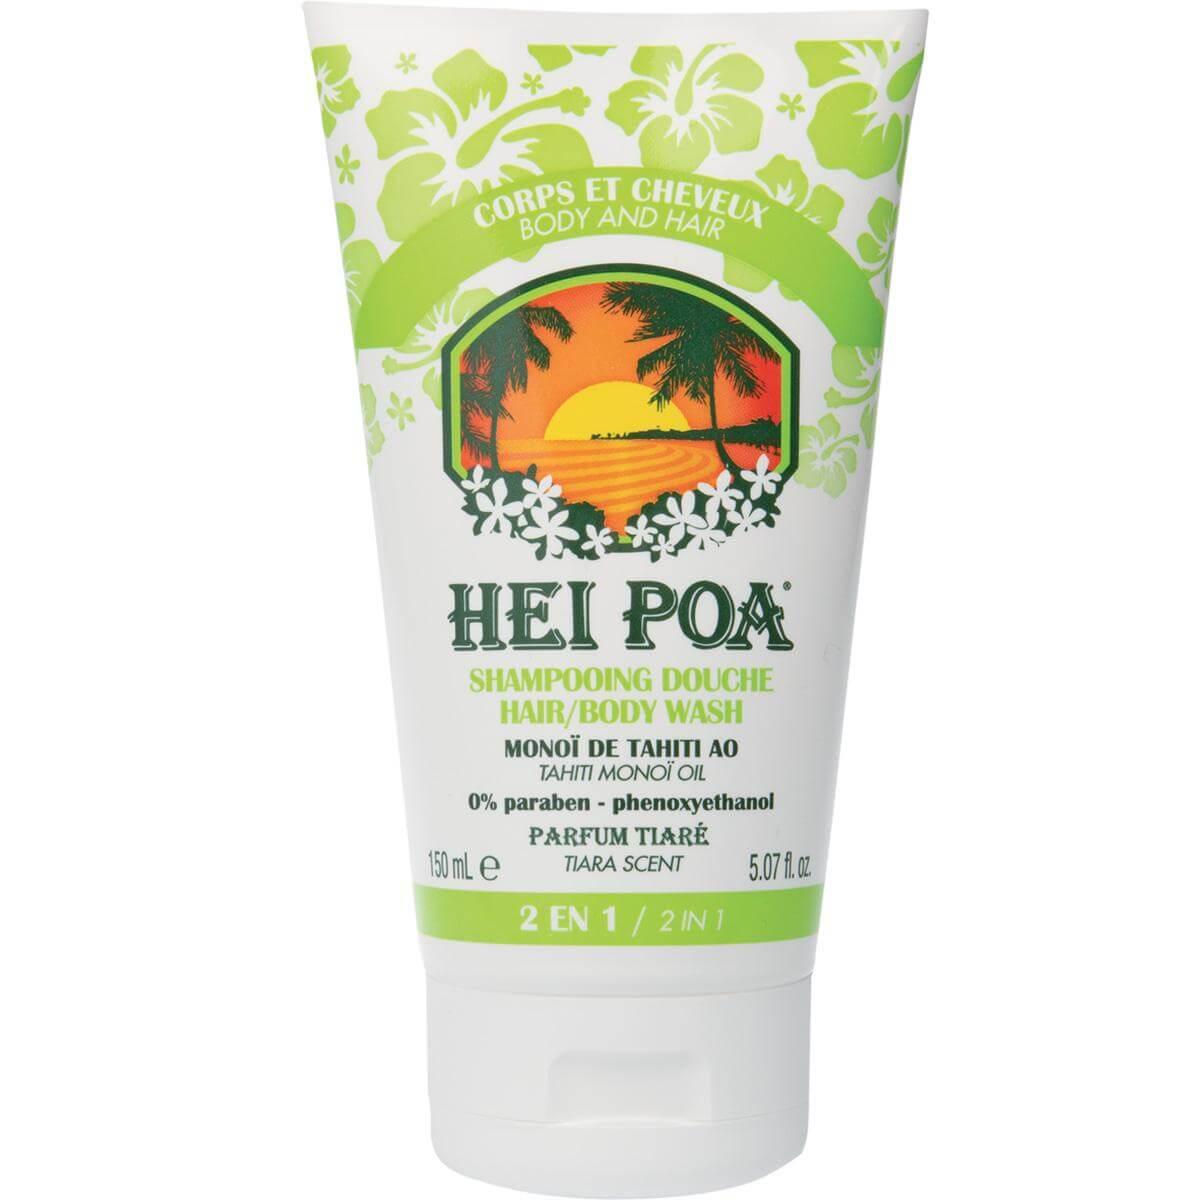 Hei Poa Shampooing DoucheΚαθαριστικόγια Σώμα &Μαλλιά με Άρωμα Tiare150ml